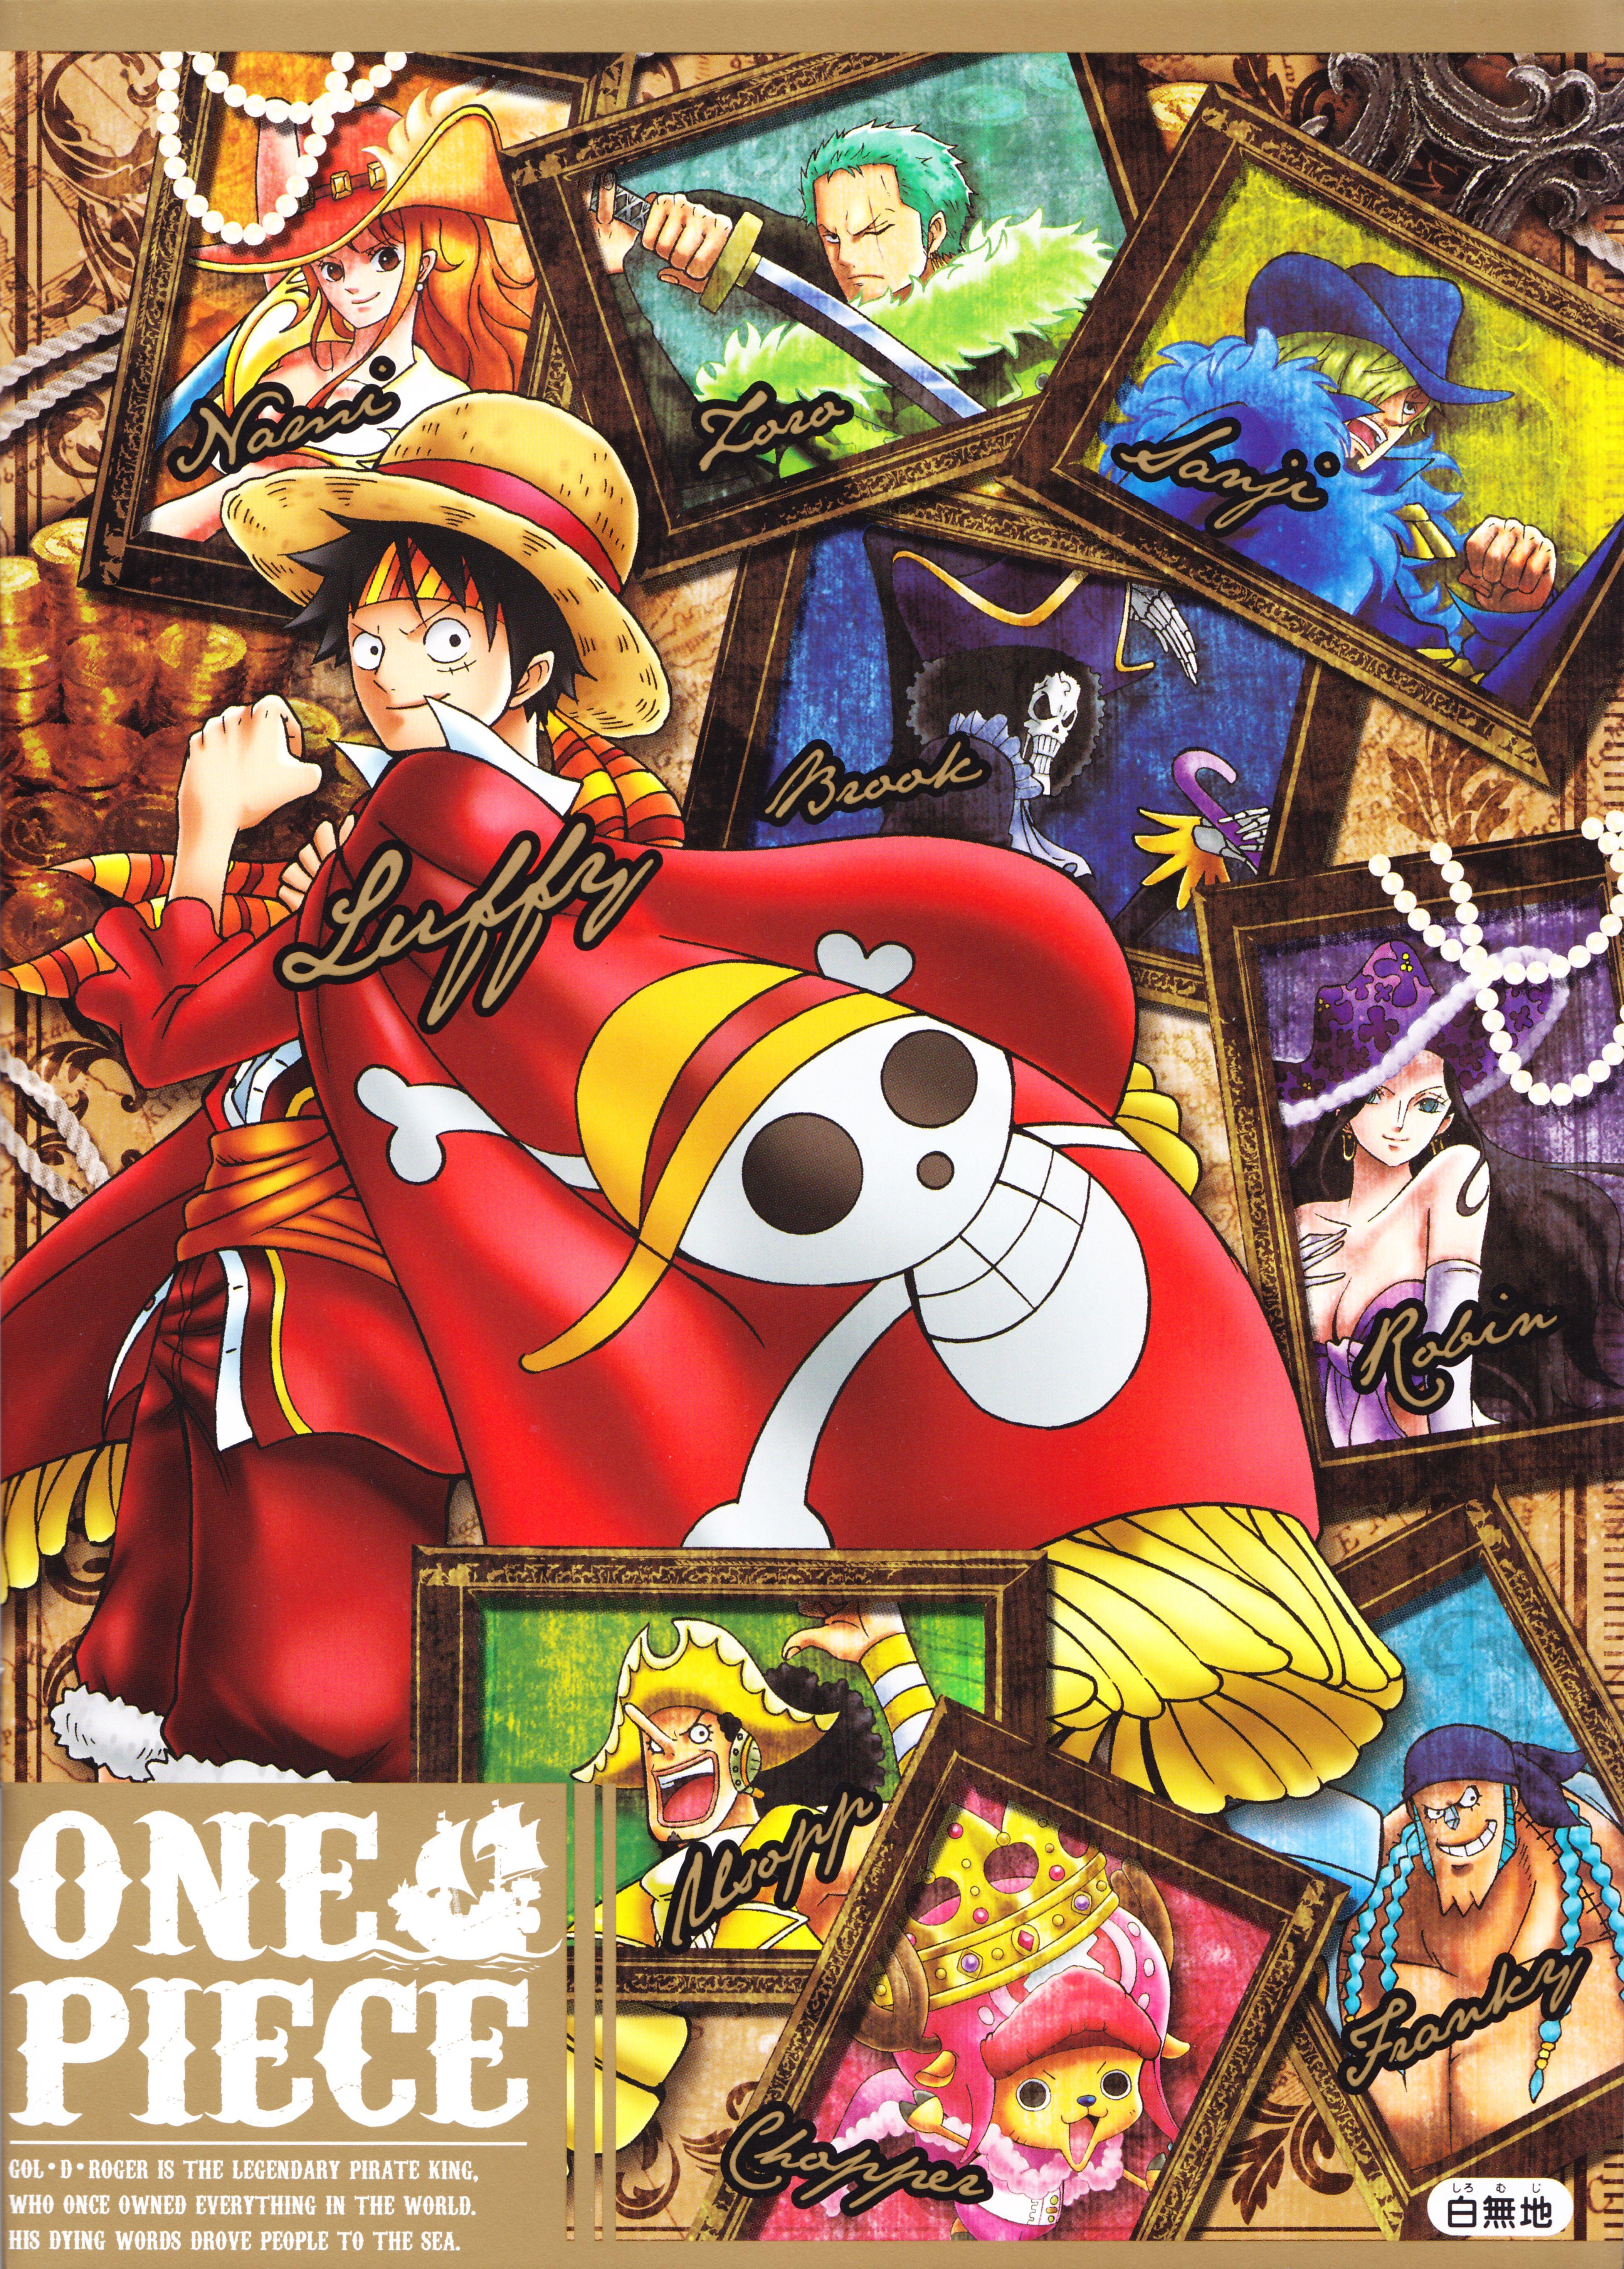 Download One Piece One Piece 15ht ANNIVERSARY (4214x5888